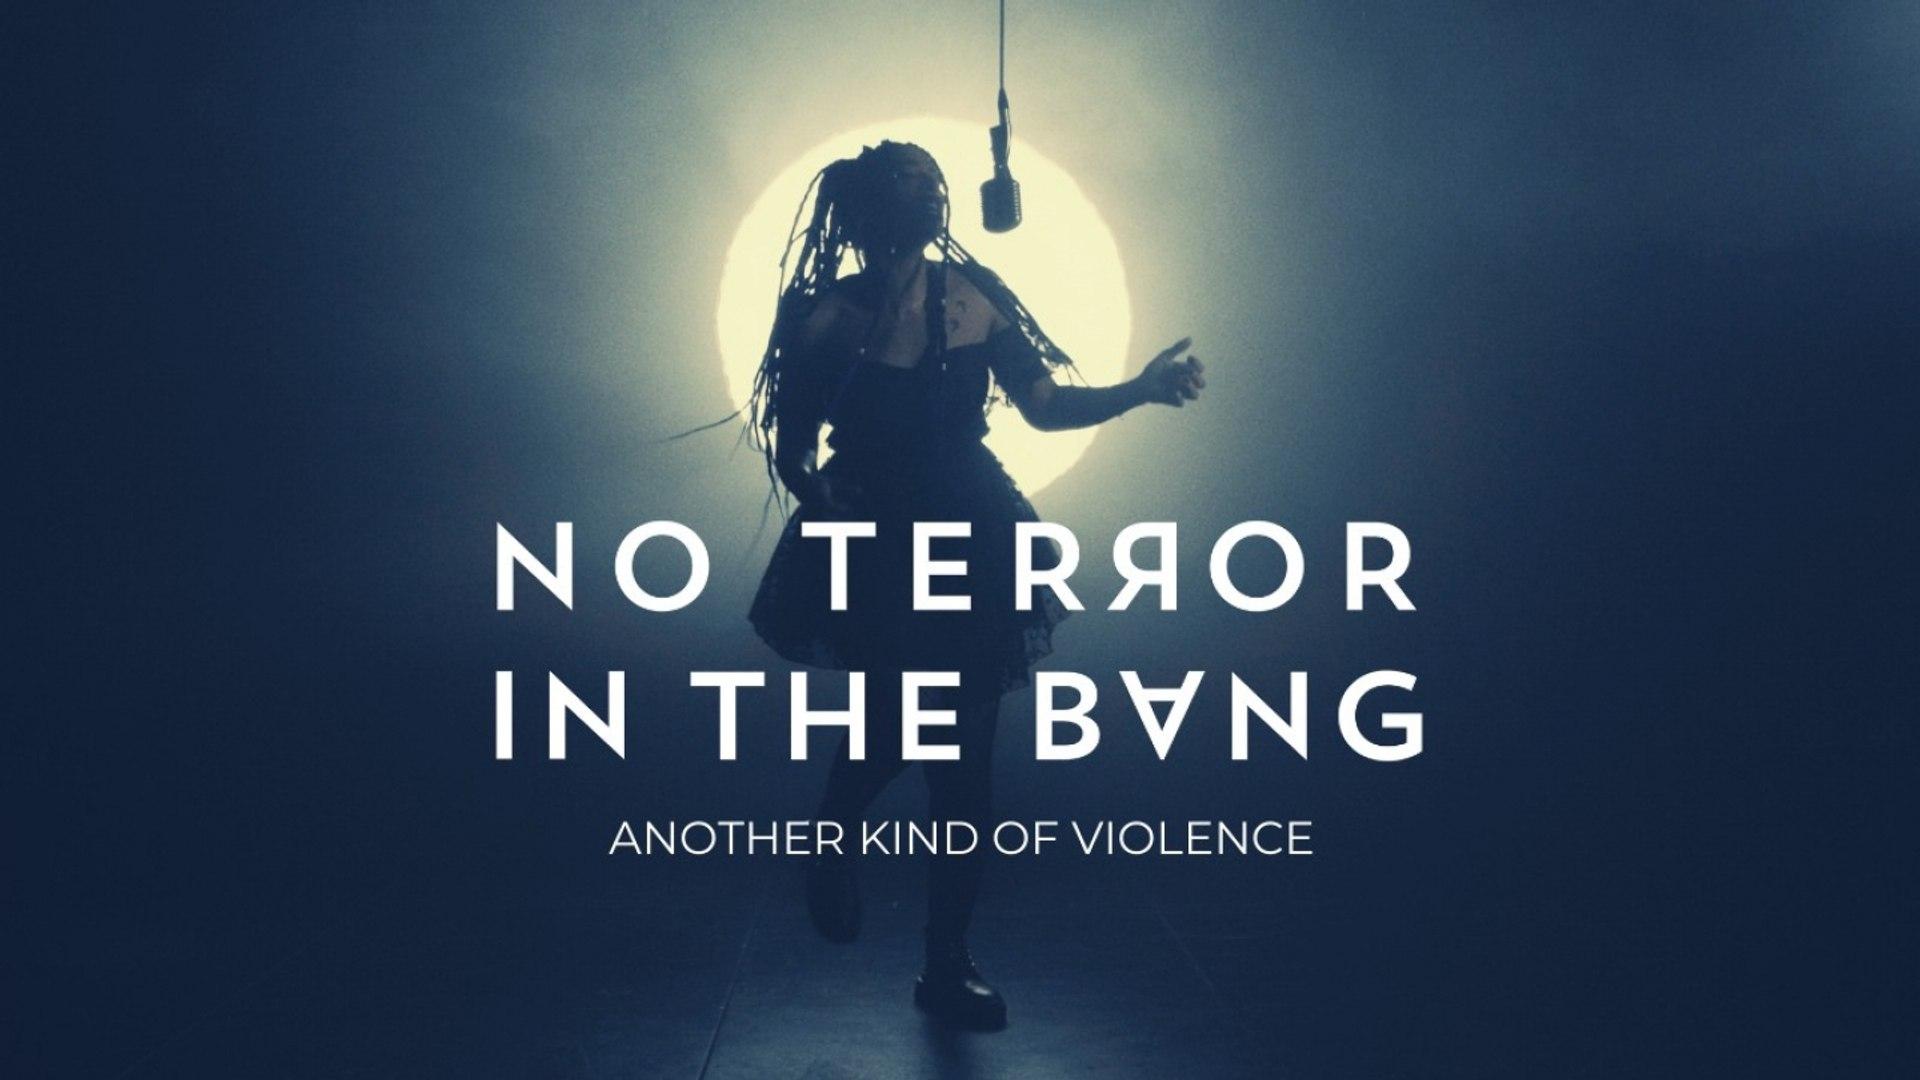 NO TERROR IN THE BANG